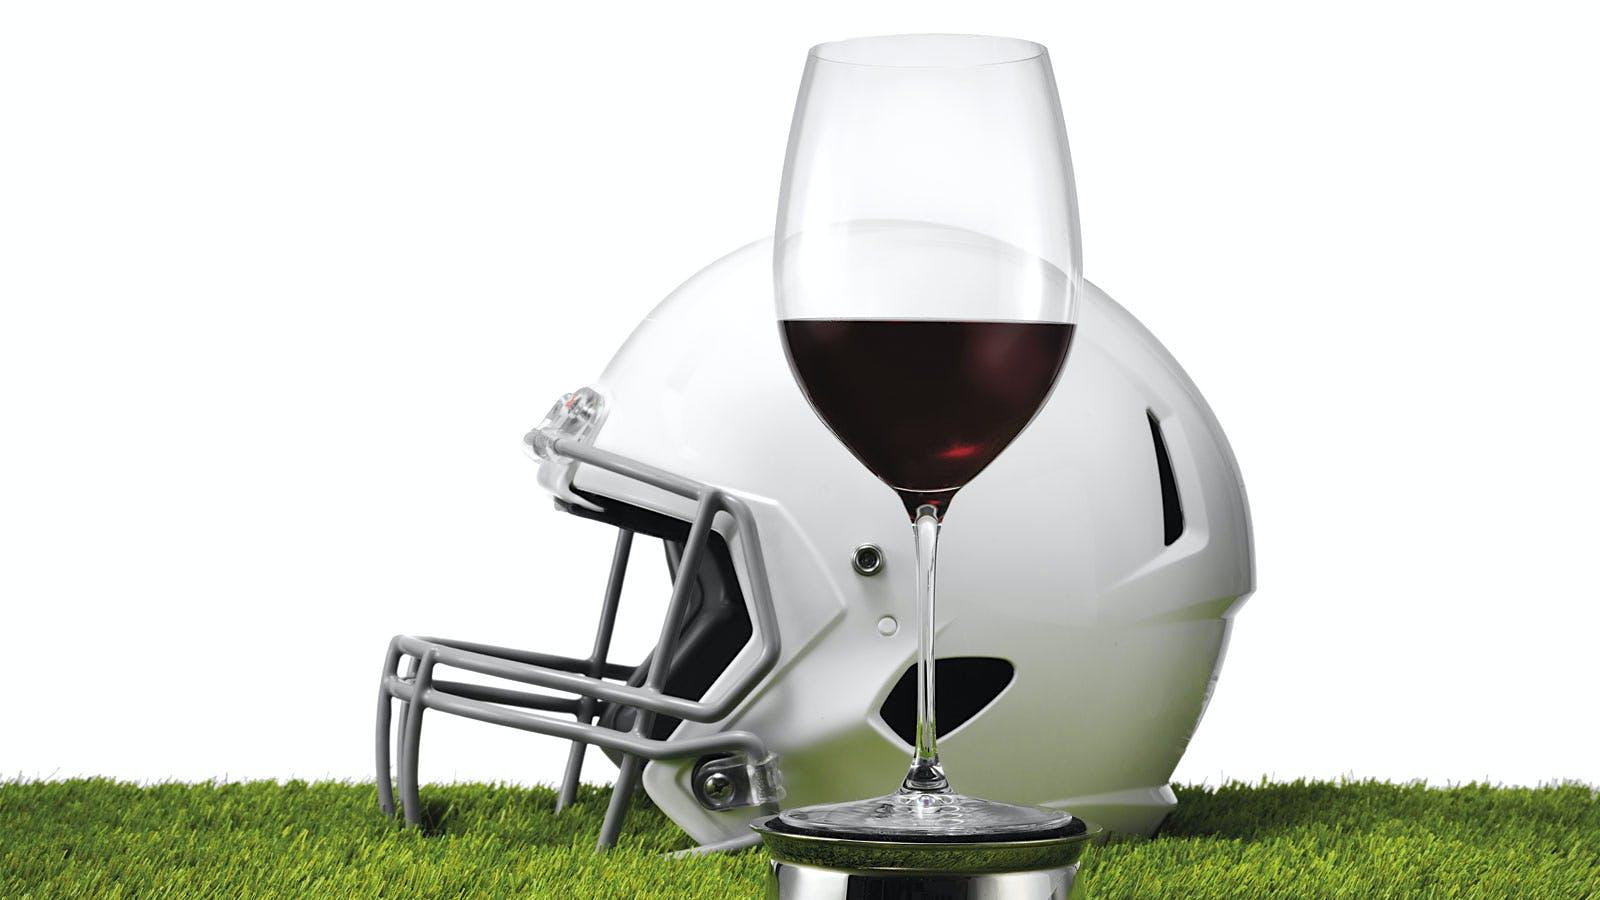 Wine Scores a Touchdown